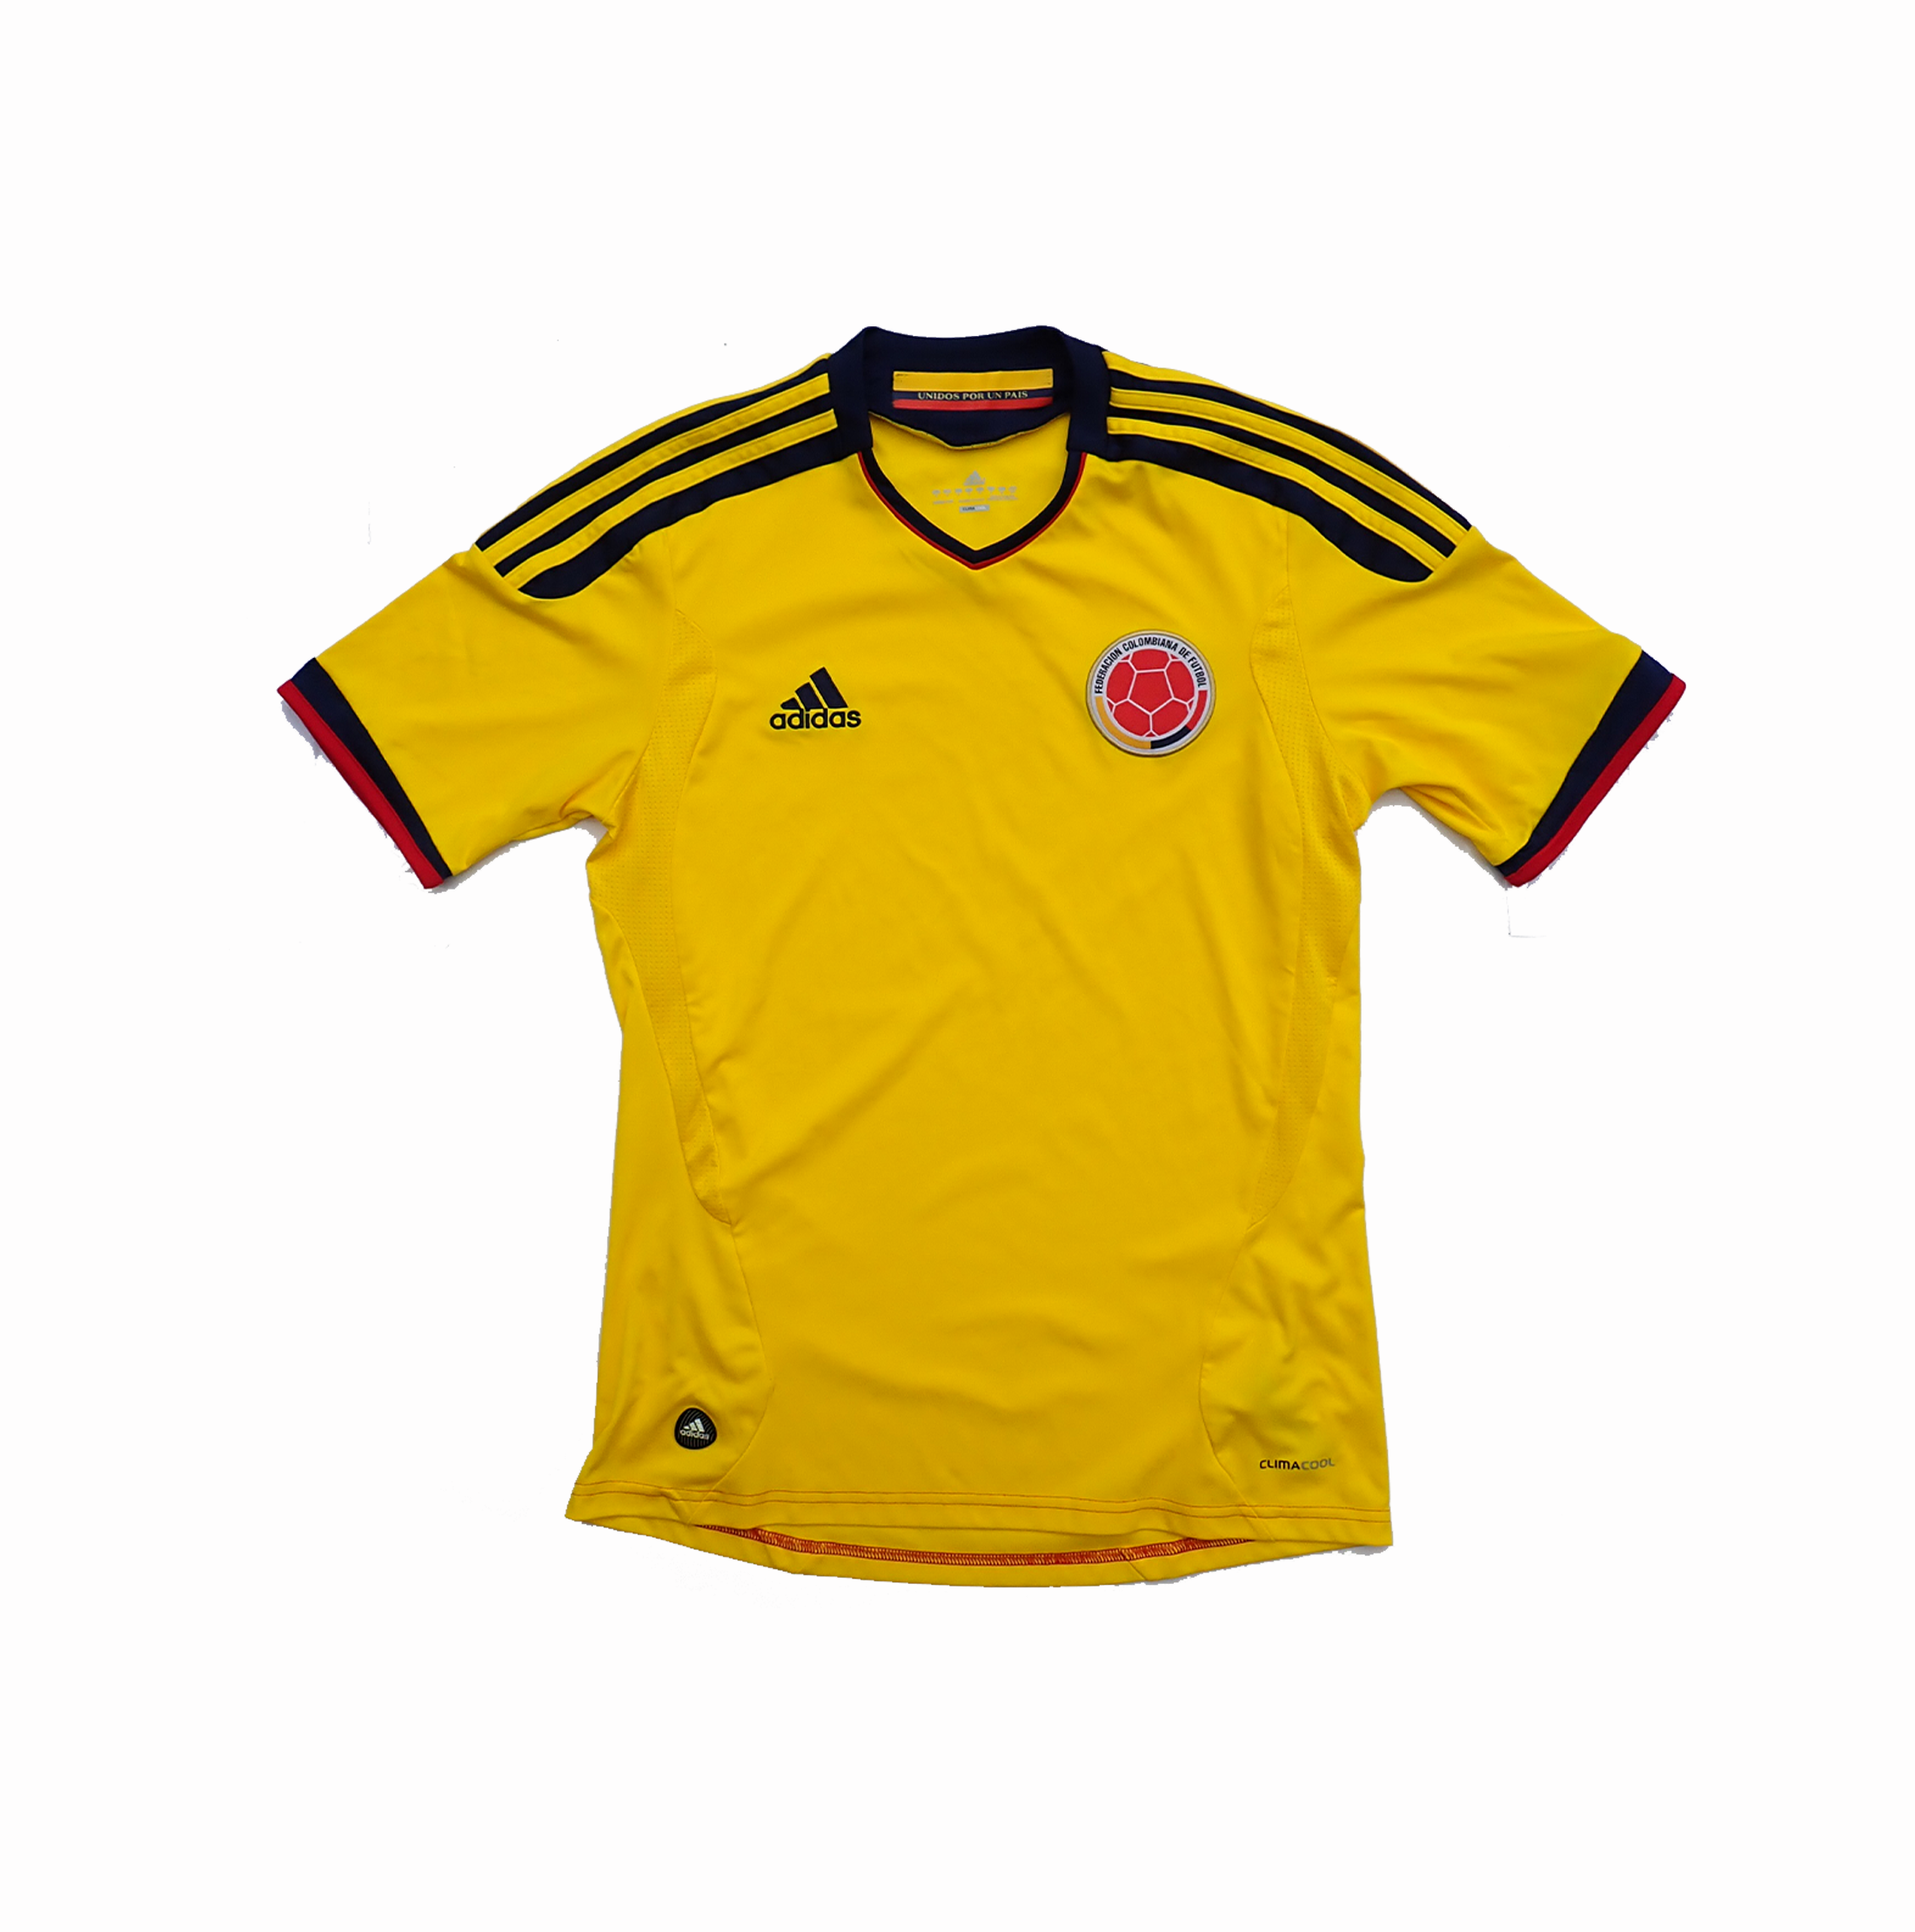 Adidas Columbia Football Team Jersey